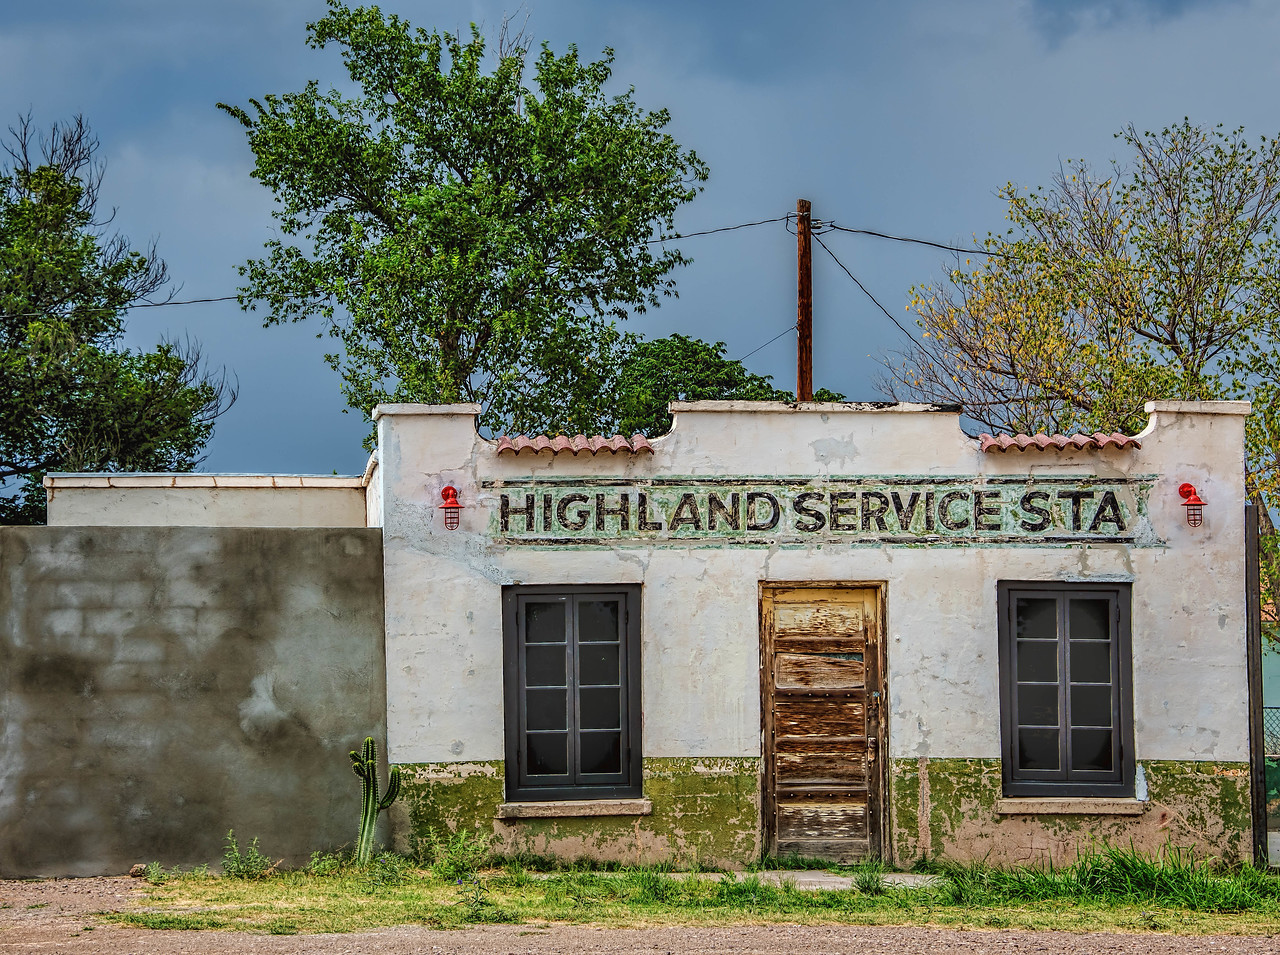 Near Marfa, Texas